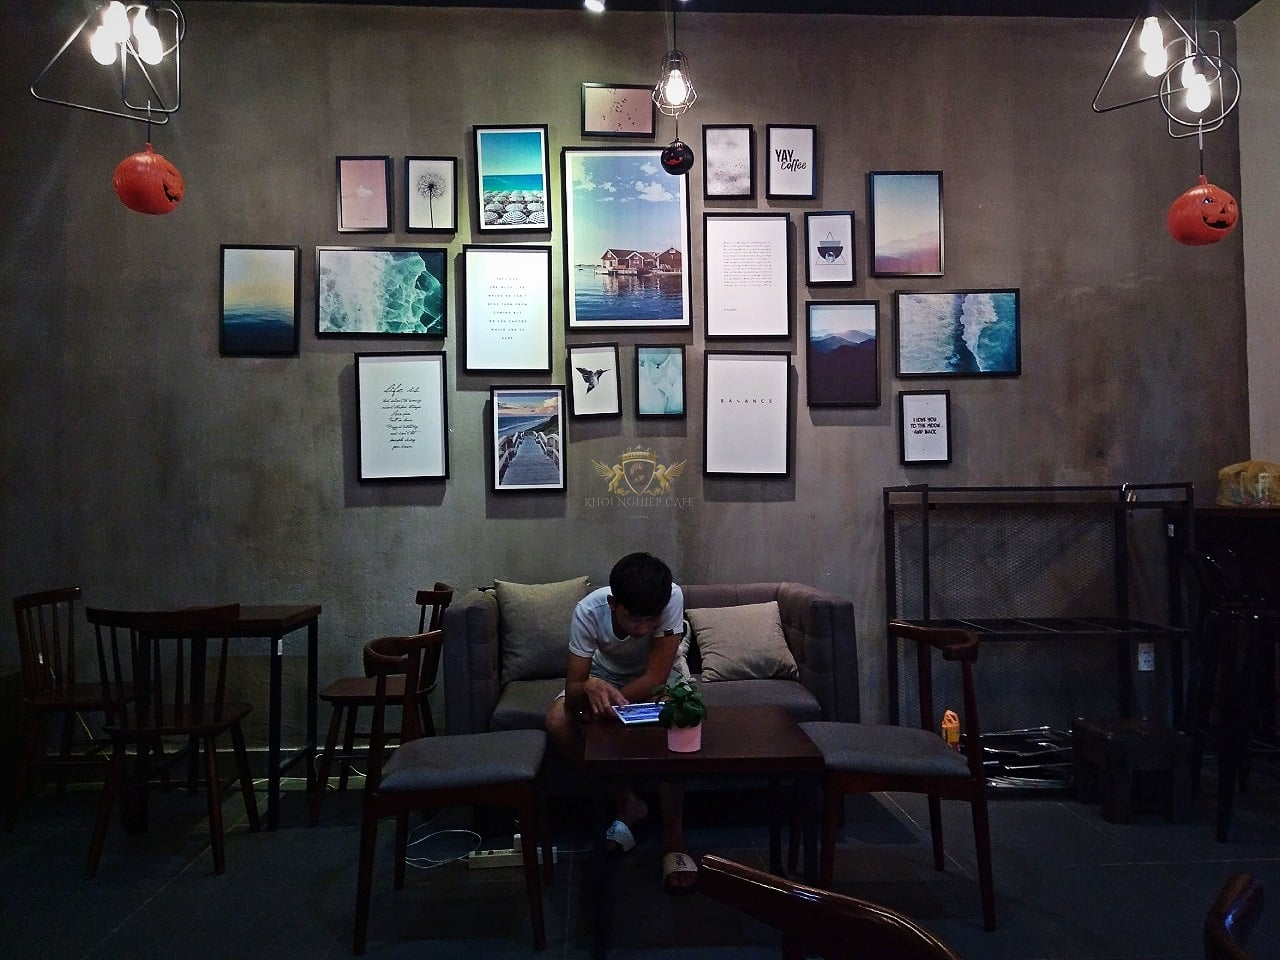 Dom Cafe Go Vap mua ban may pha cafe chuyen nghiep cua y Faema E98 RE A2 HC600 khoi nghiep cafe 16